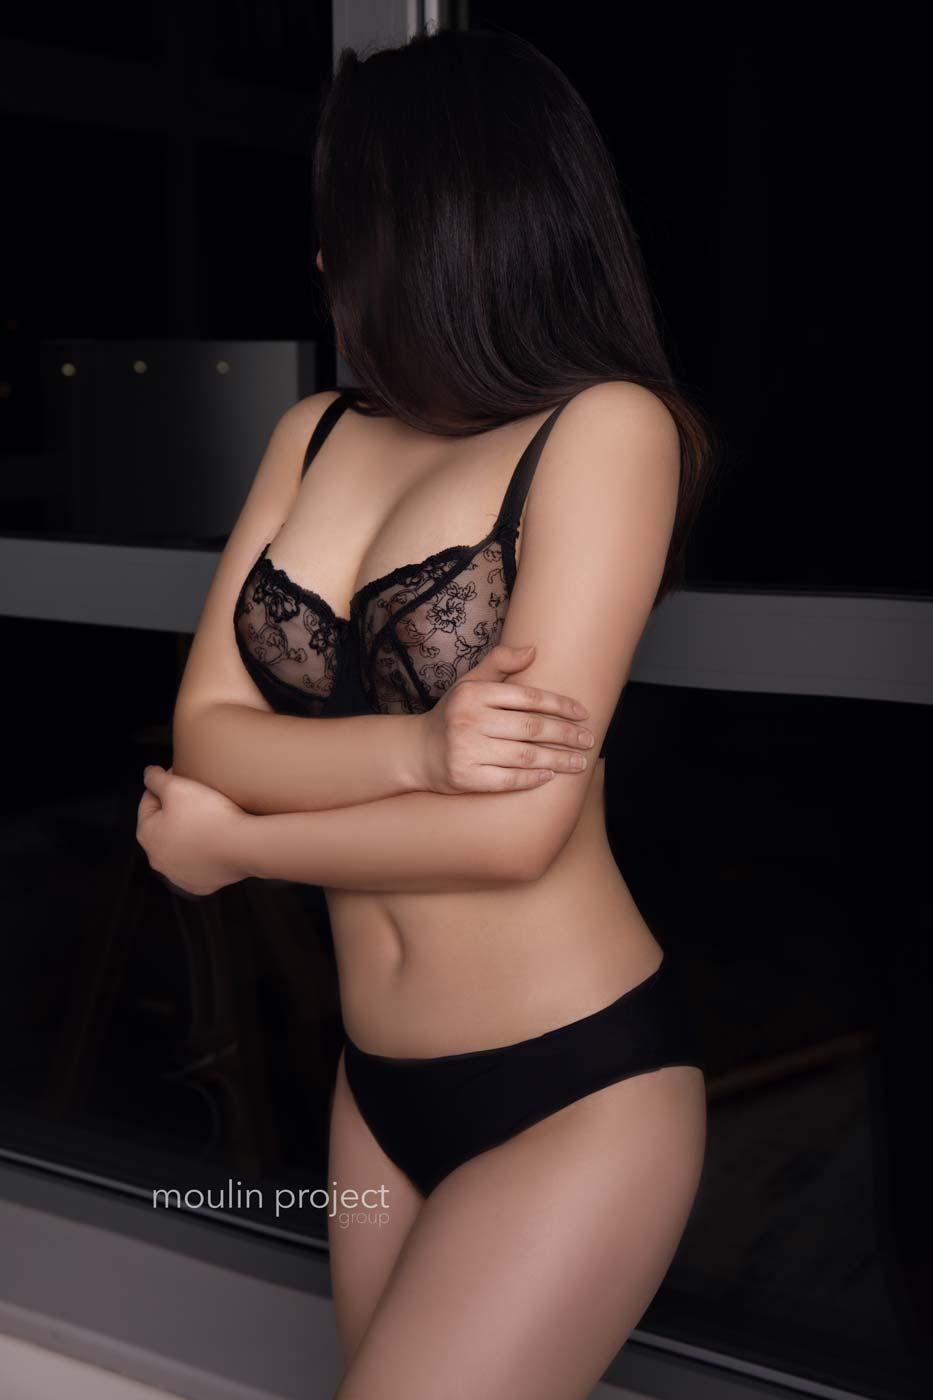 Zara erotic